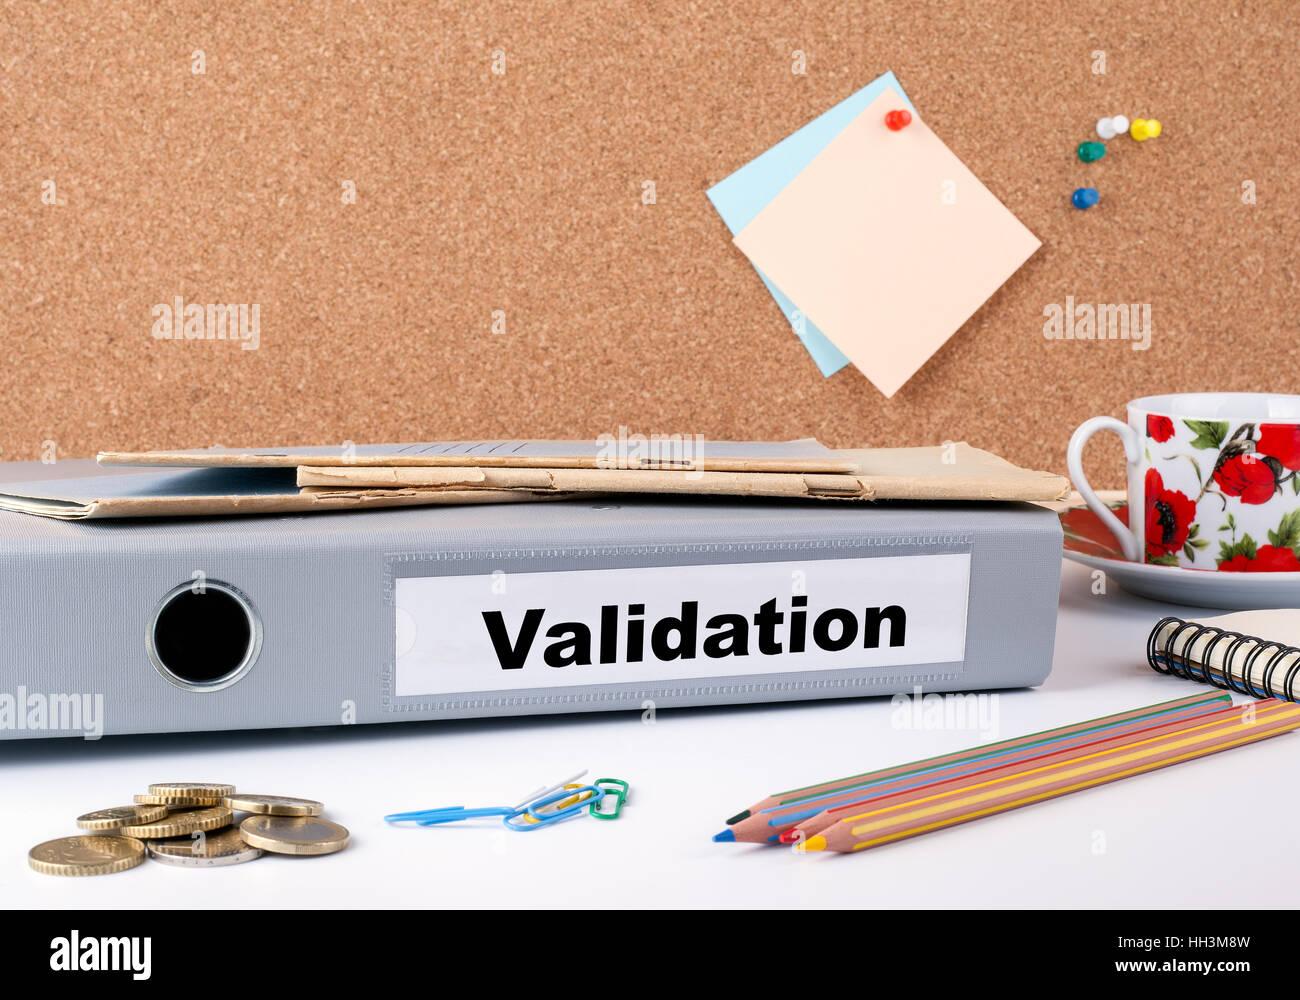 Validation. Folder on office desk. Money, Coffee Mug and colored pencils. - Stock Image